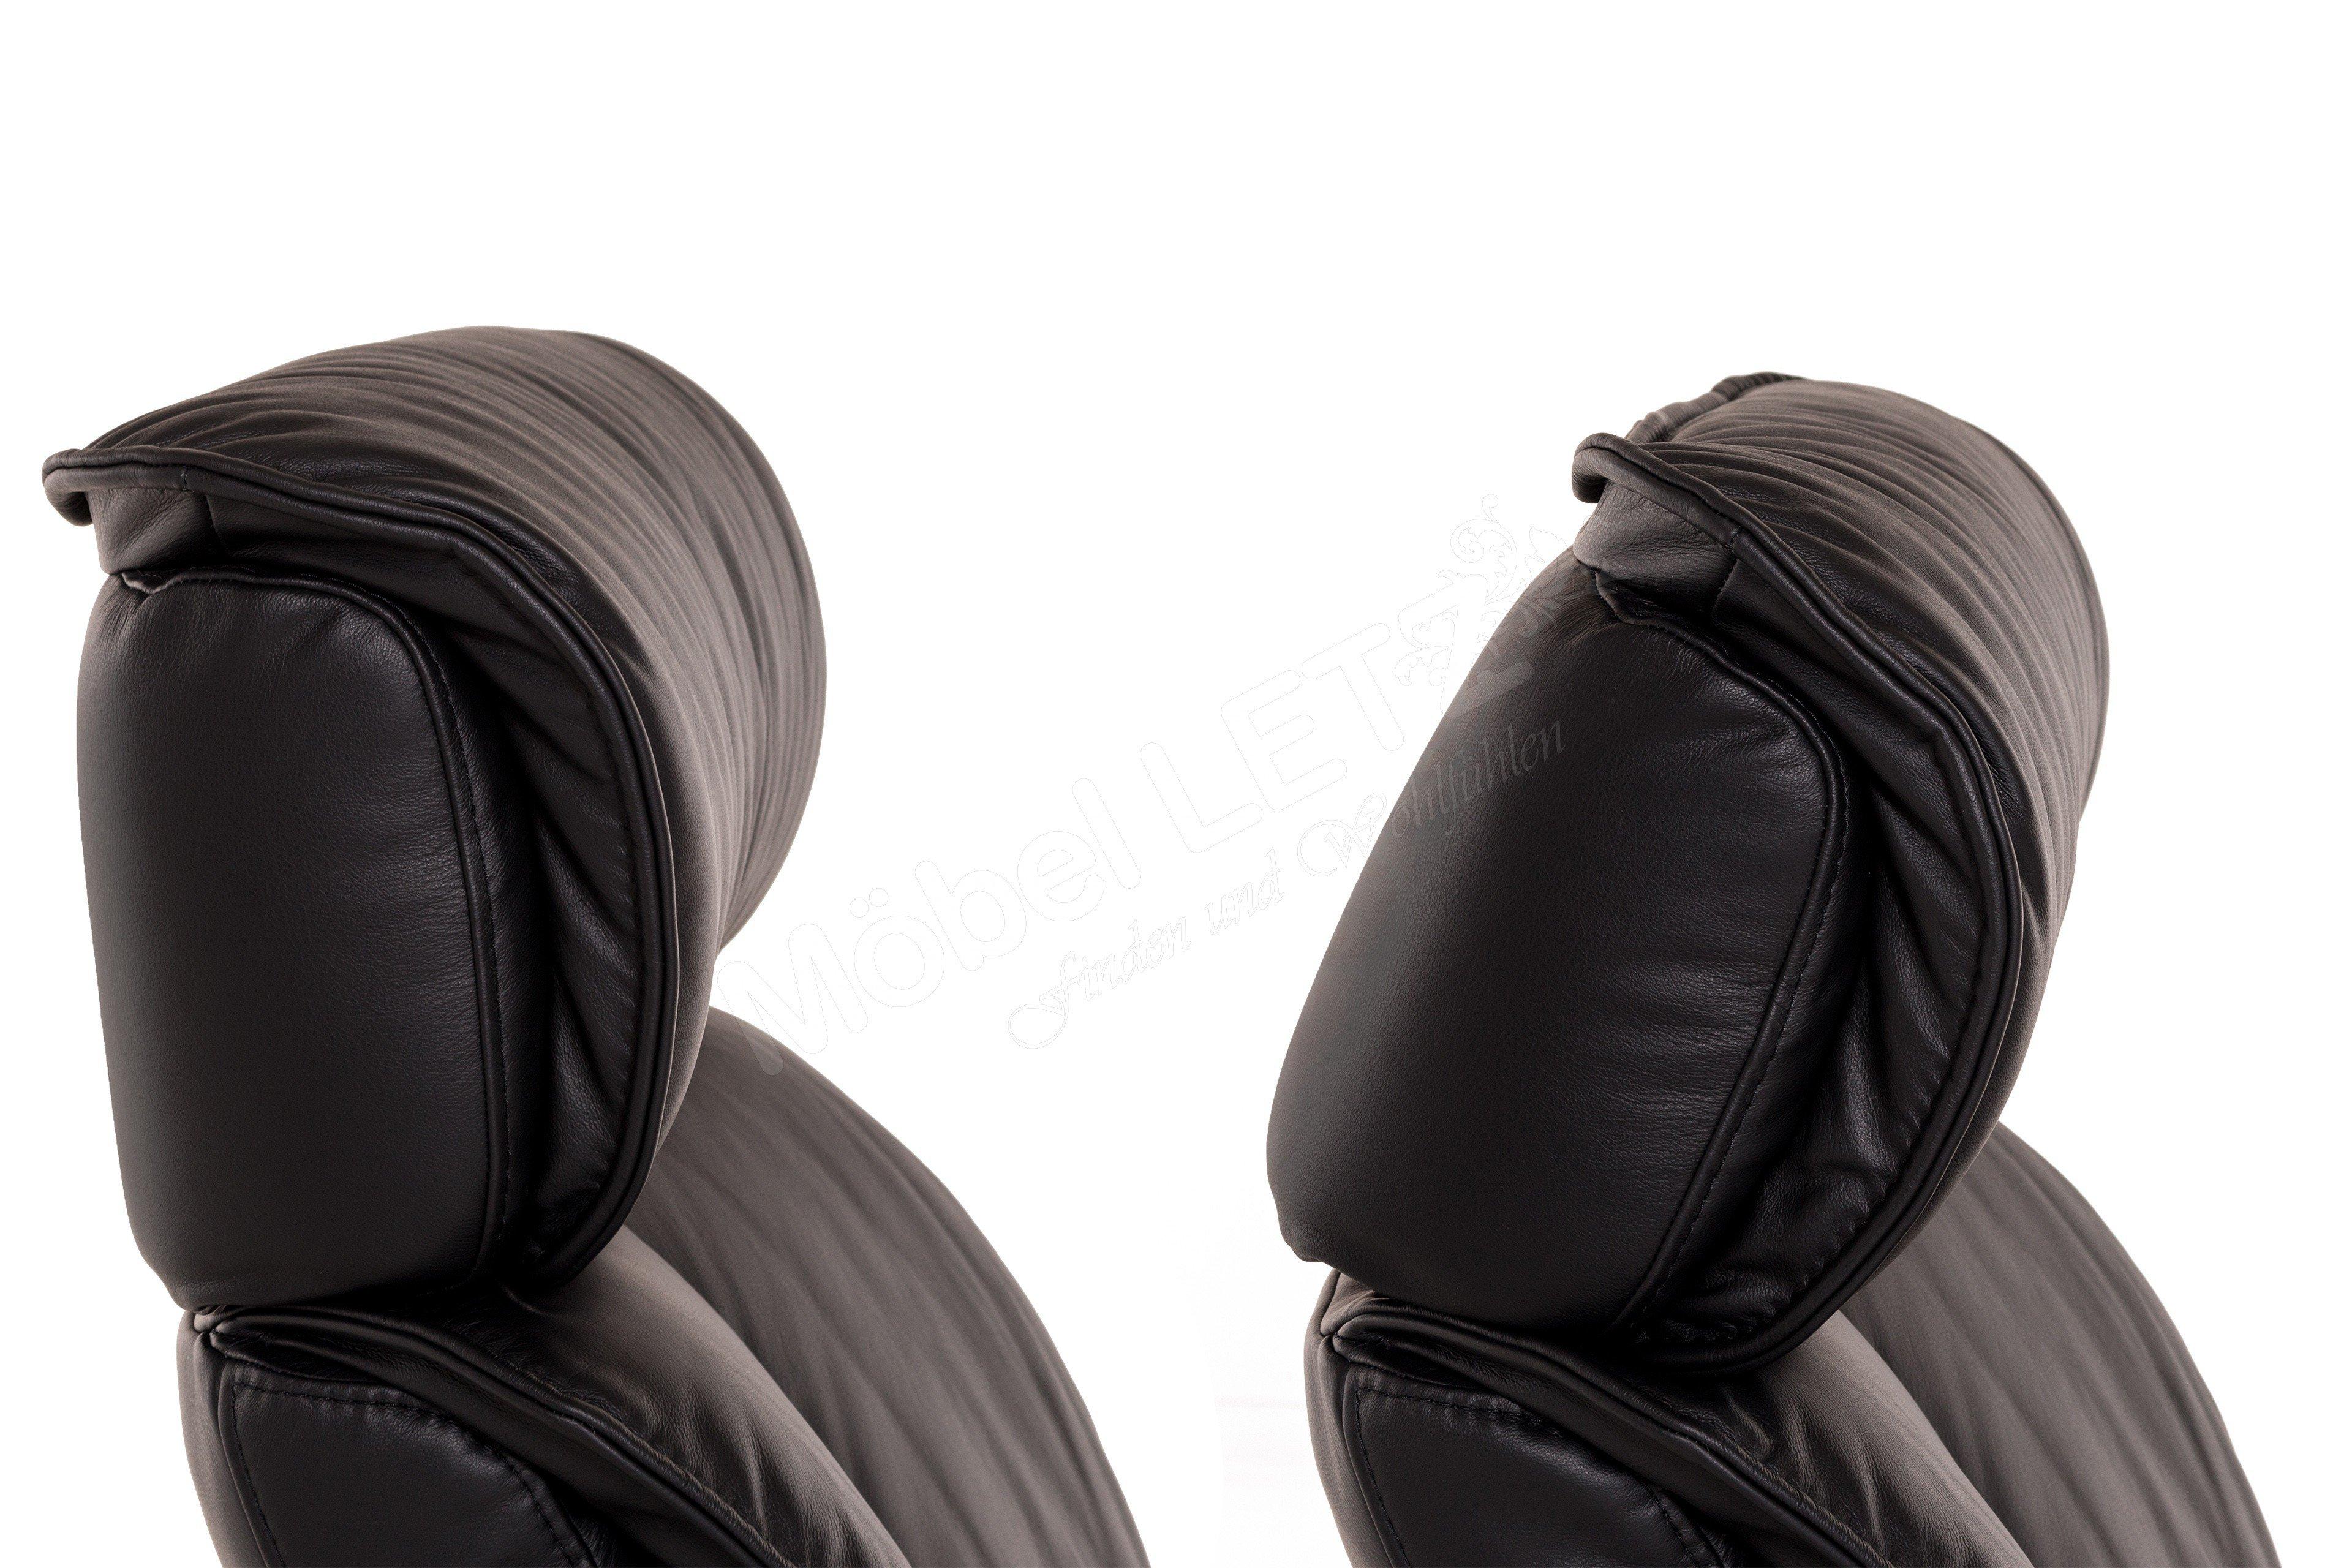 img comfort carina relaxsessel in schwarz m bel letz ihr online shop. Black Bedroom Furniture Sets. Home Design Ideas